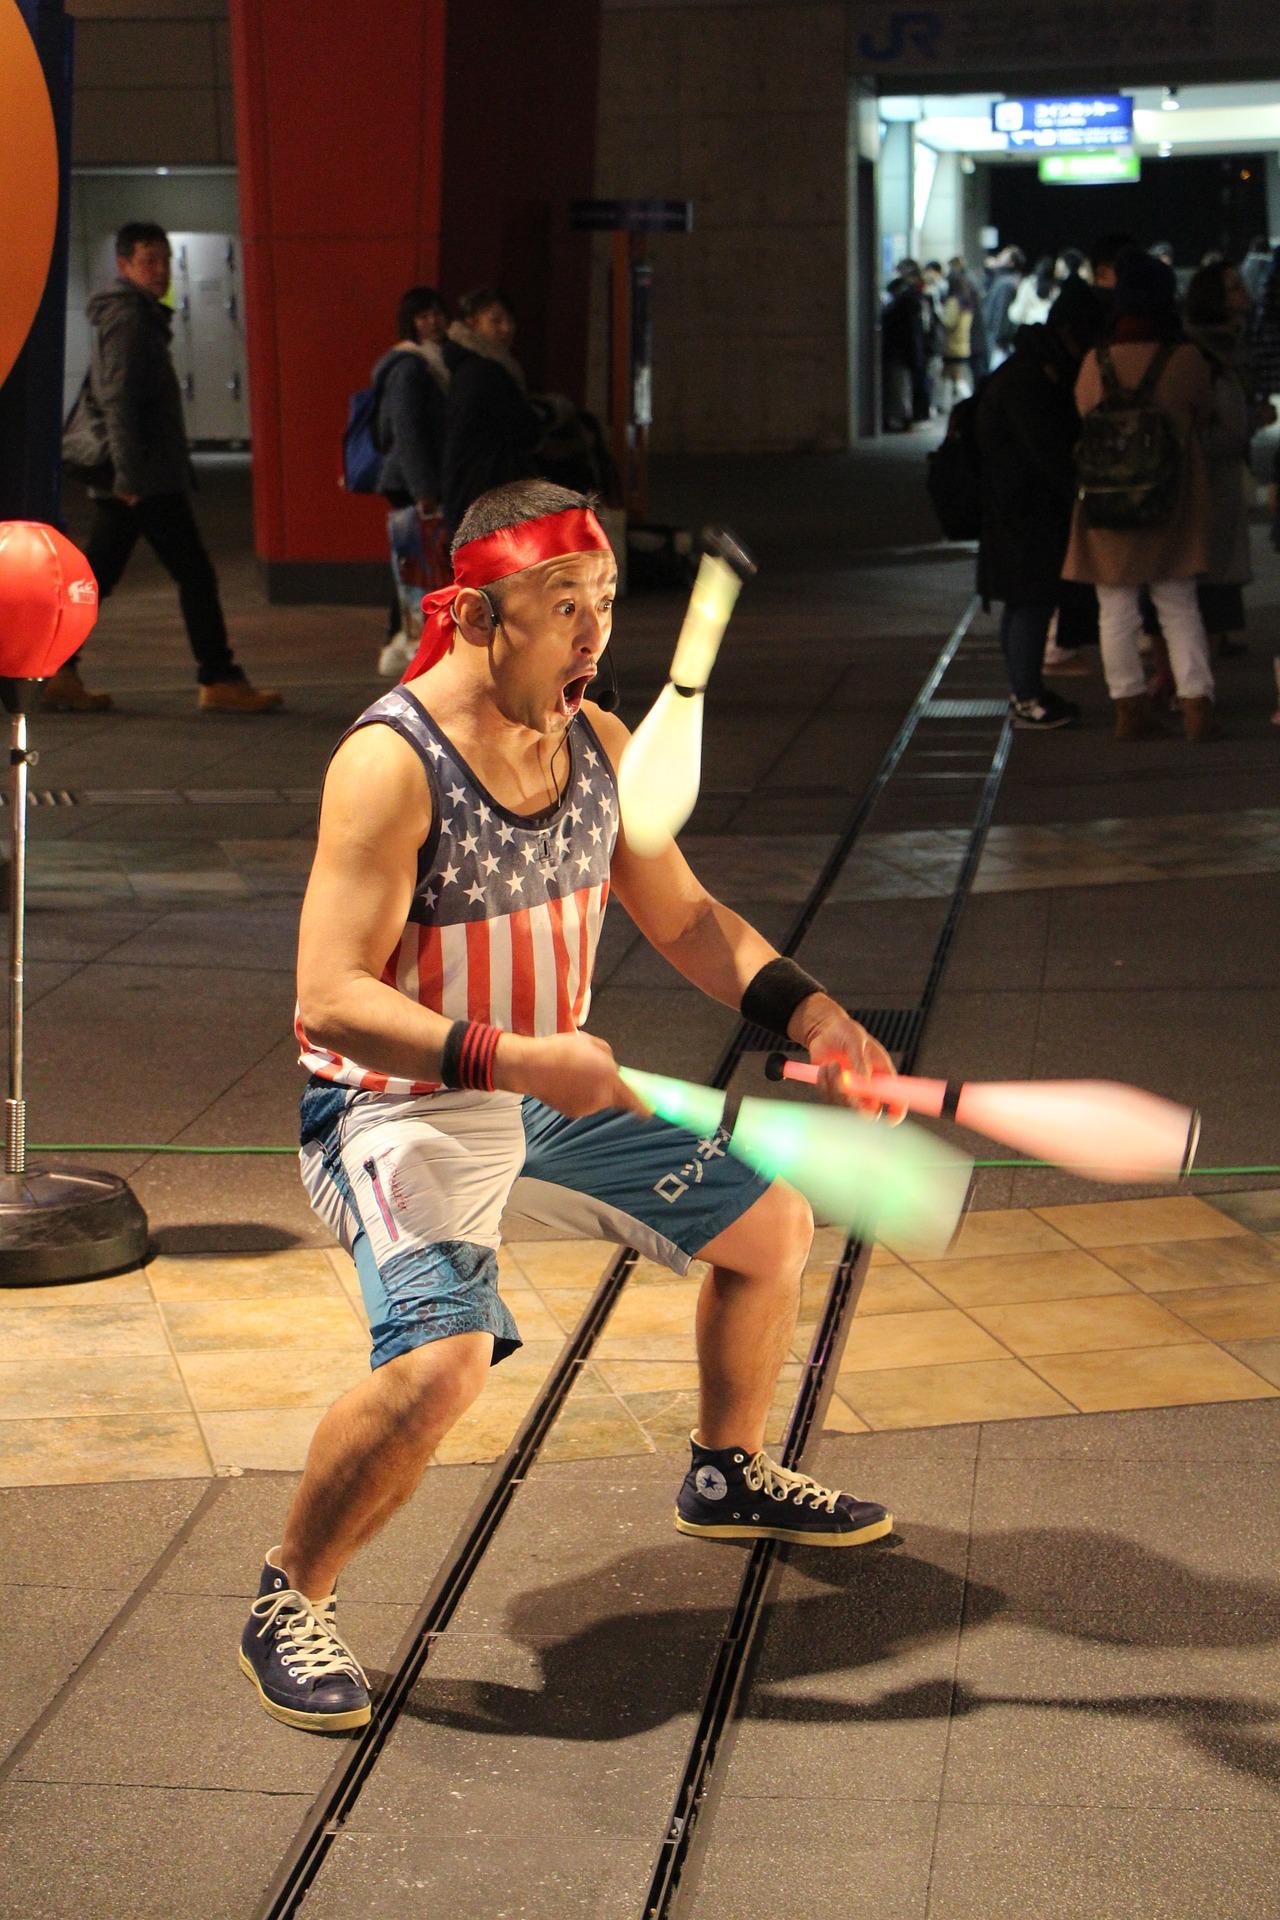 juggling-1176425_1920